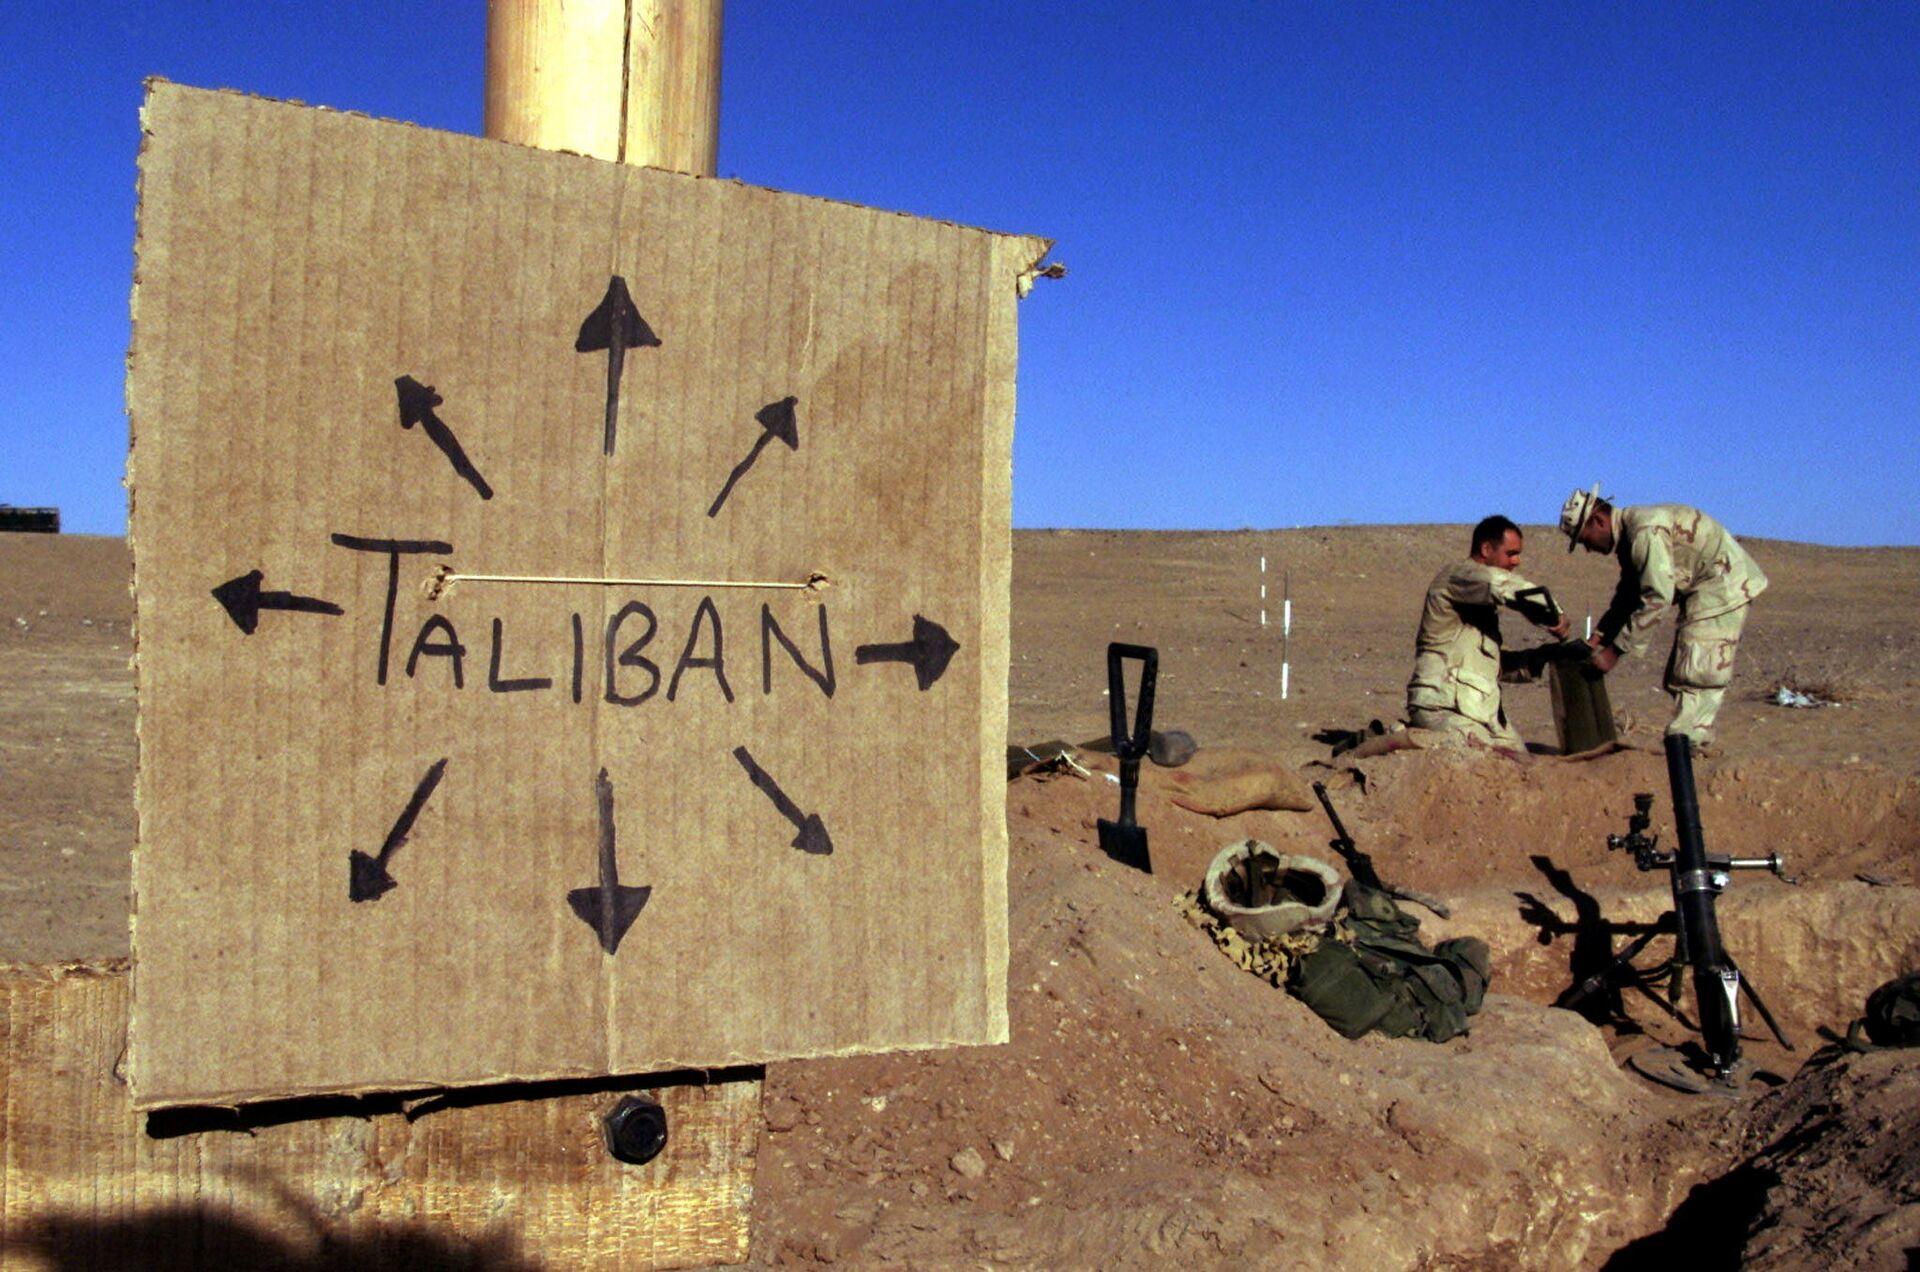 U.S. troops to withdraw from Afghanistan - Sputnik International, 1920, 07.09.2021